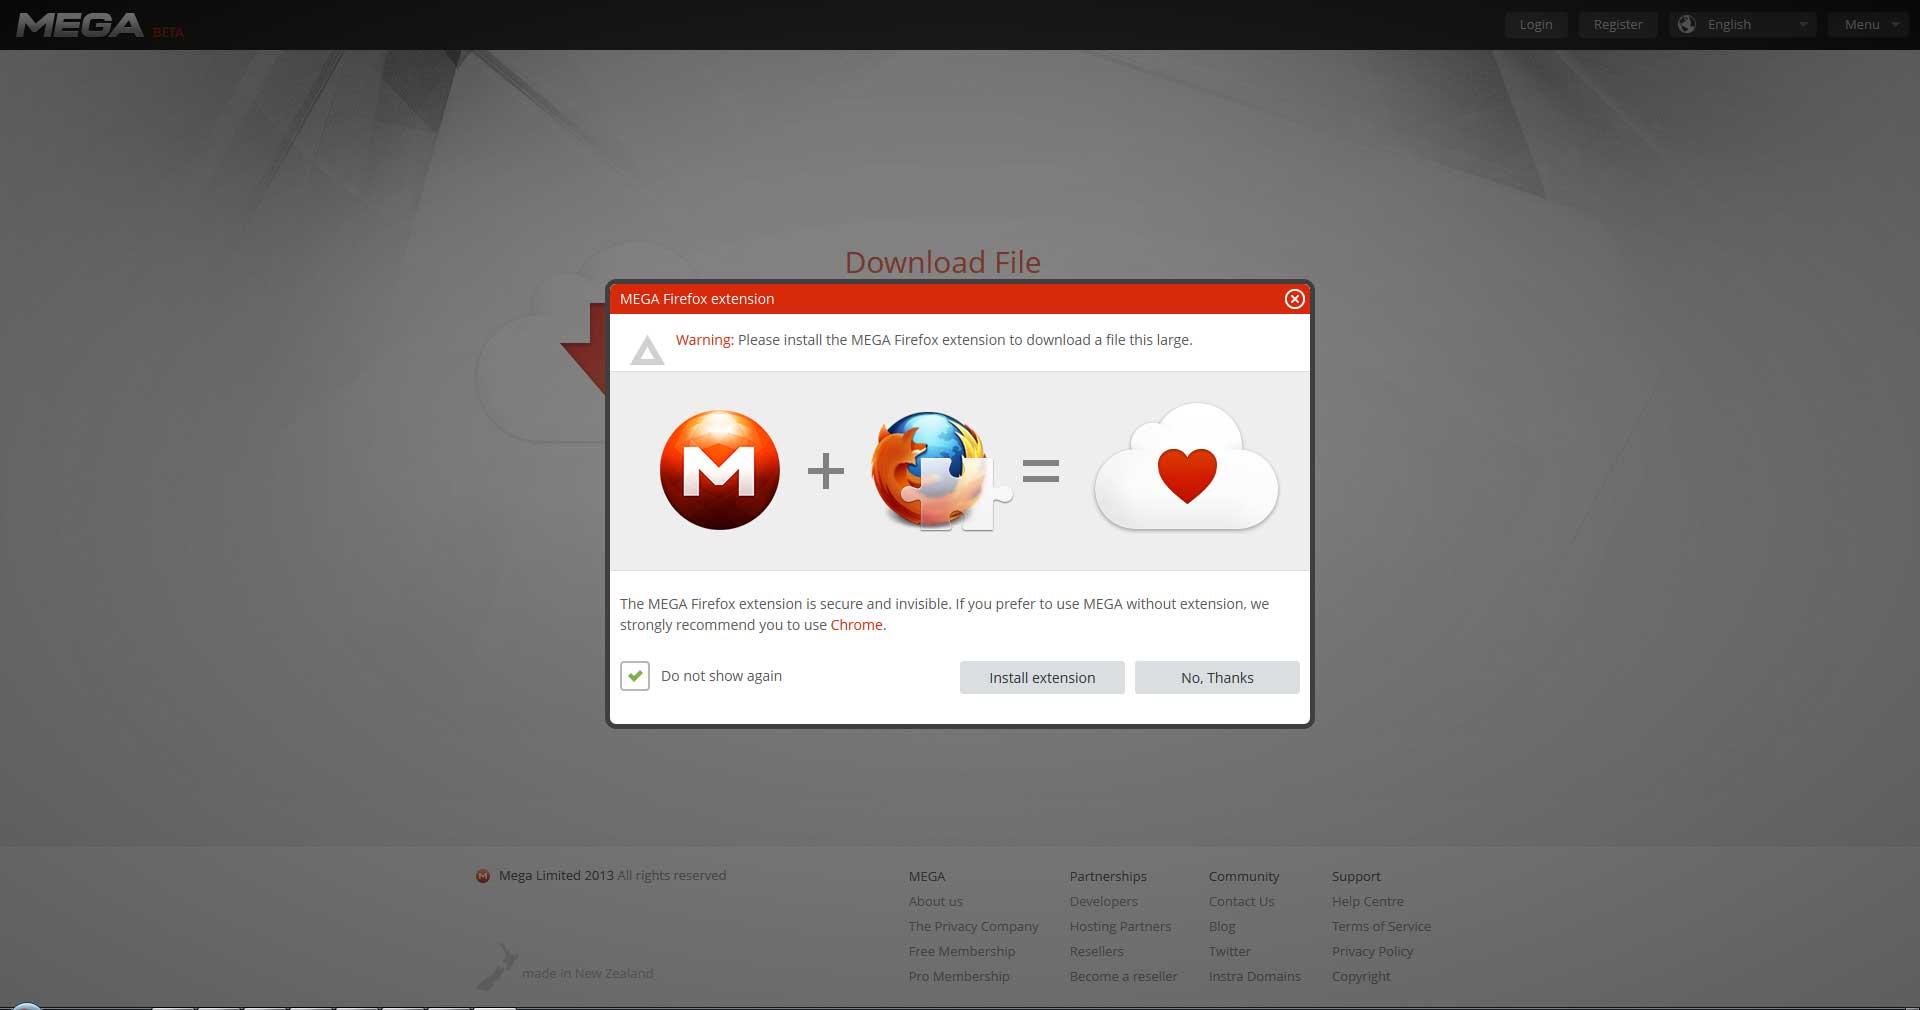 Official <b>Mega</b> <b>Firefox</b> <b>extension</b> released | MalwareTips Community